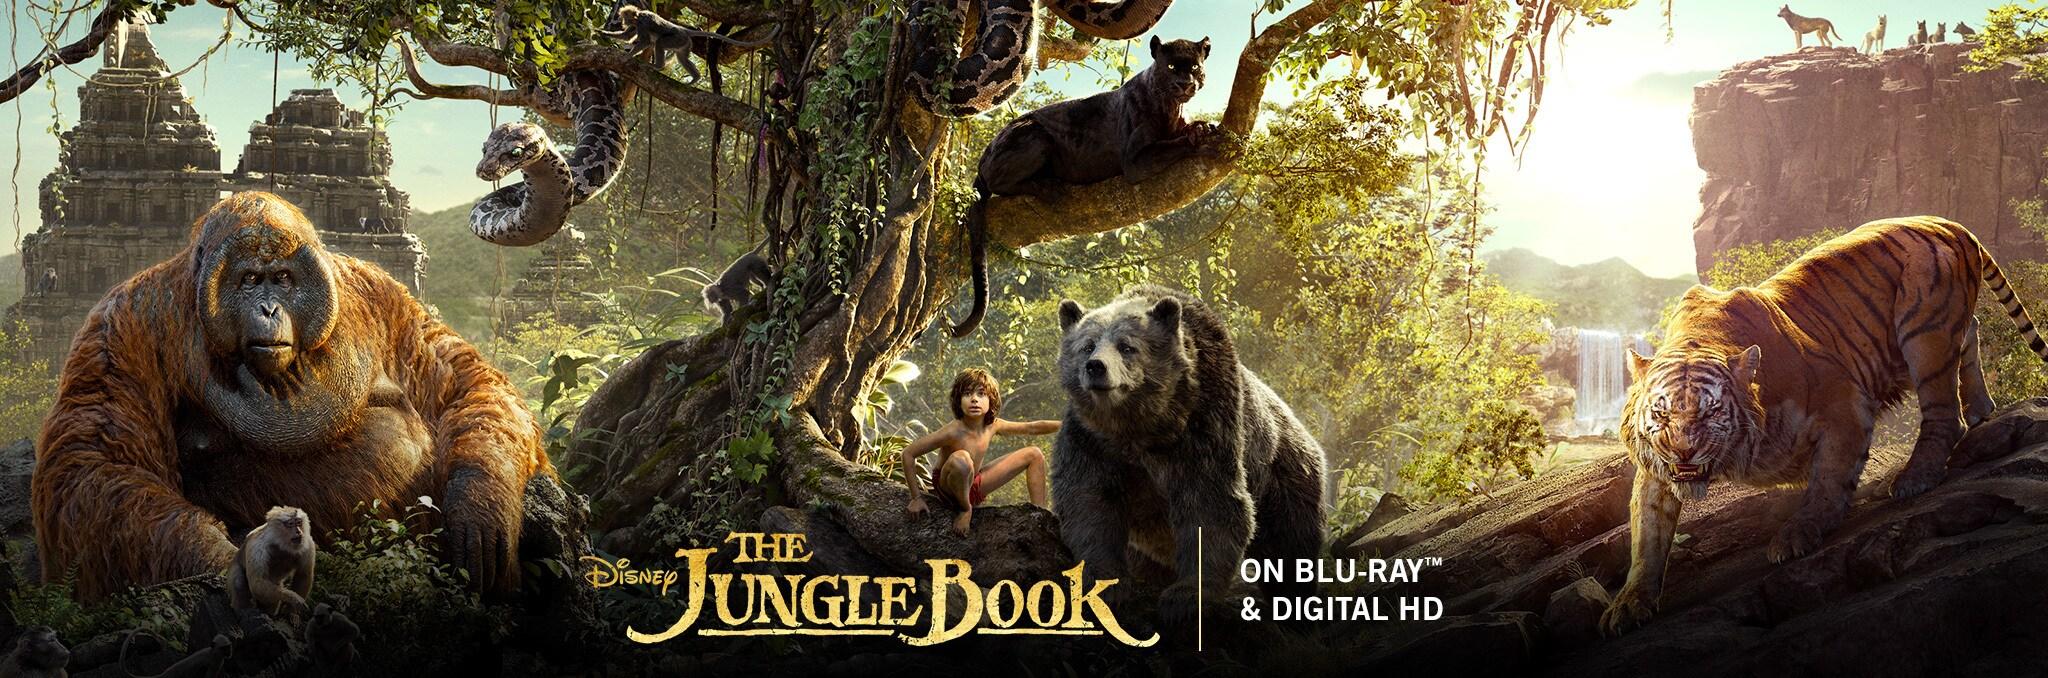 The Jungle Book In Hindi 300mb